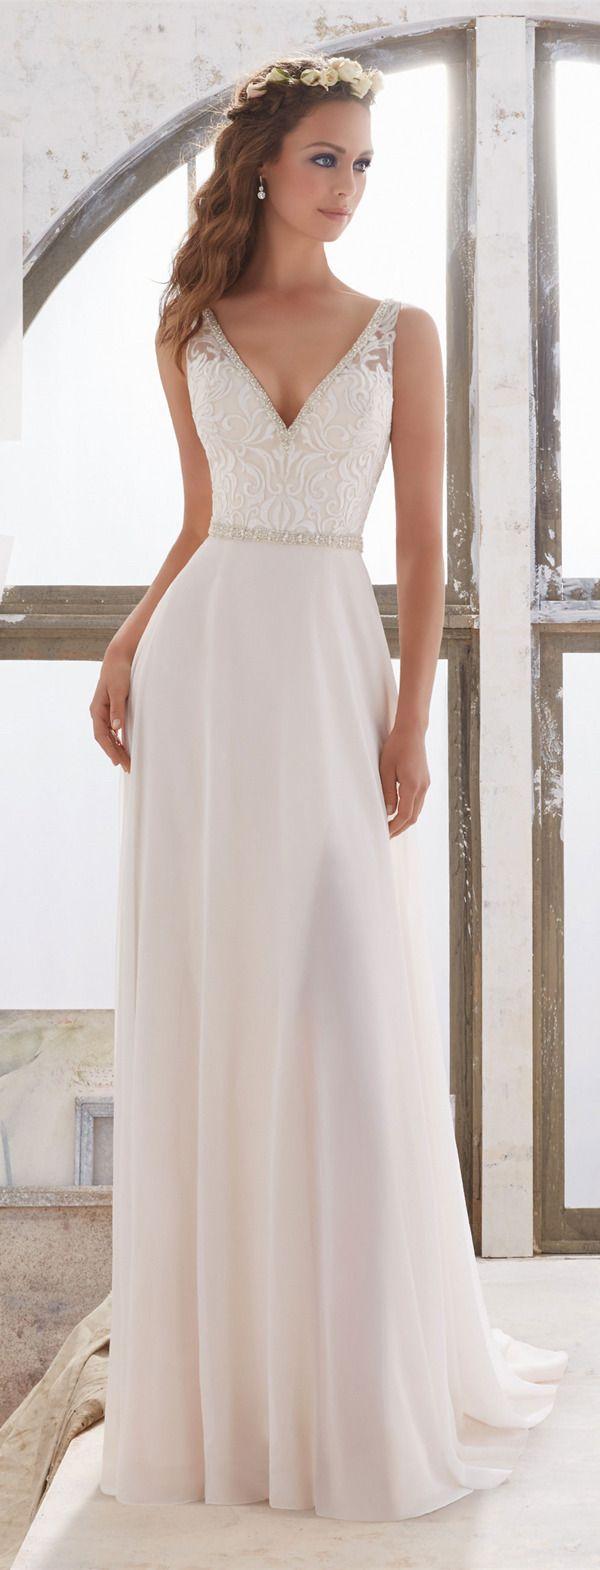 wedding dress simple simple elegant wedding dress Morilee Madeline Gardner Wedding Dresses Collection Simple DressesElegant